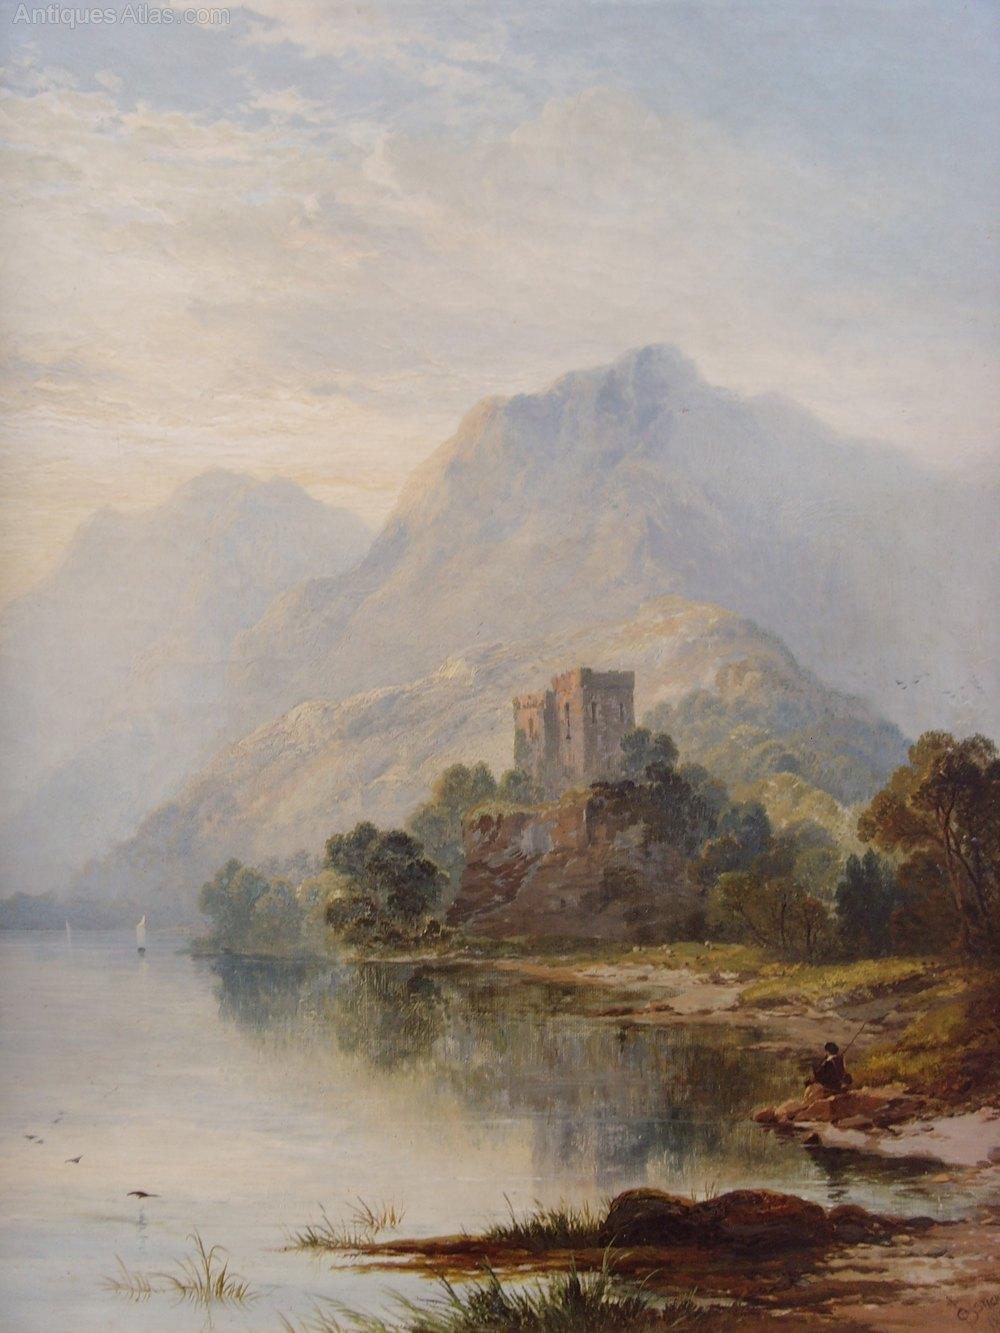 Antiques Atlas George Blackie Sticks Oil Loch Ness 1877